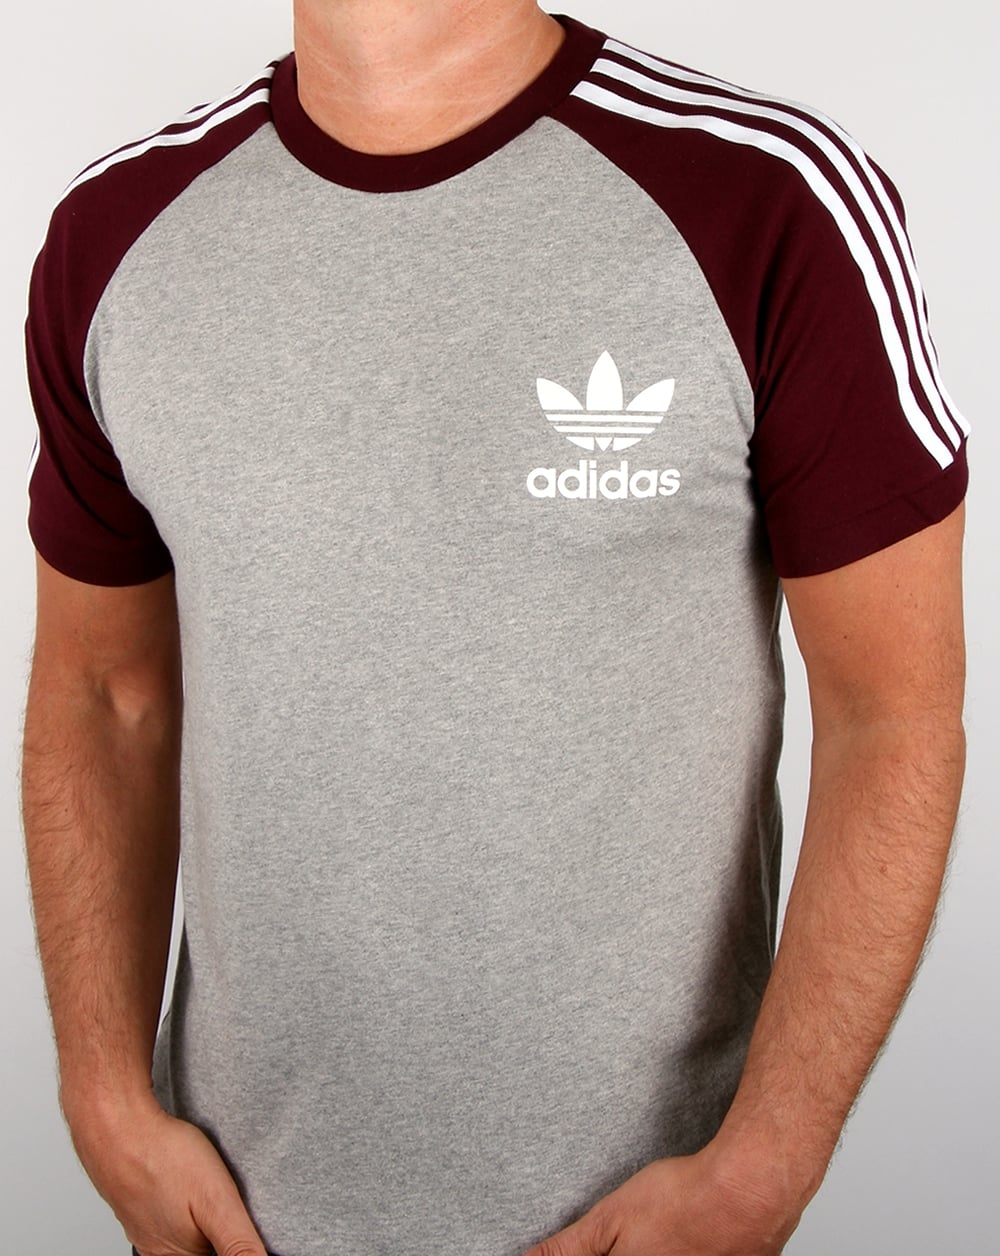 Adidas Originals Retro 3 Stripes T shirt Greymaroon